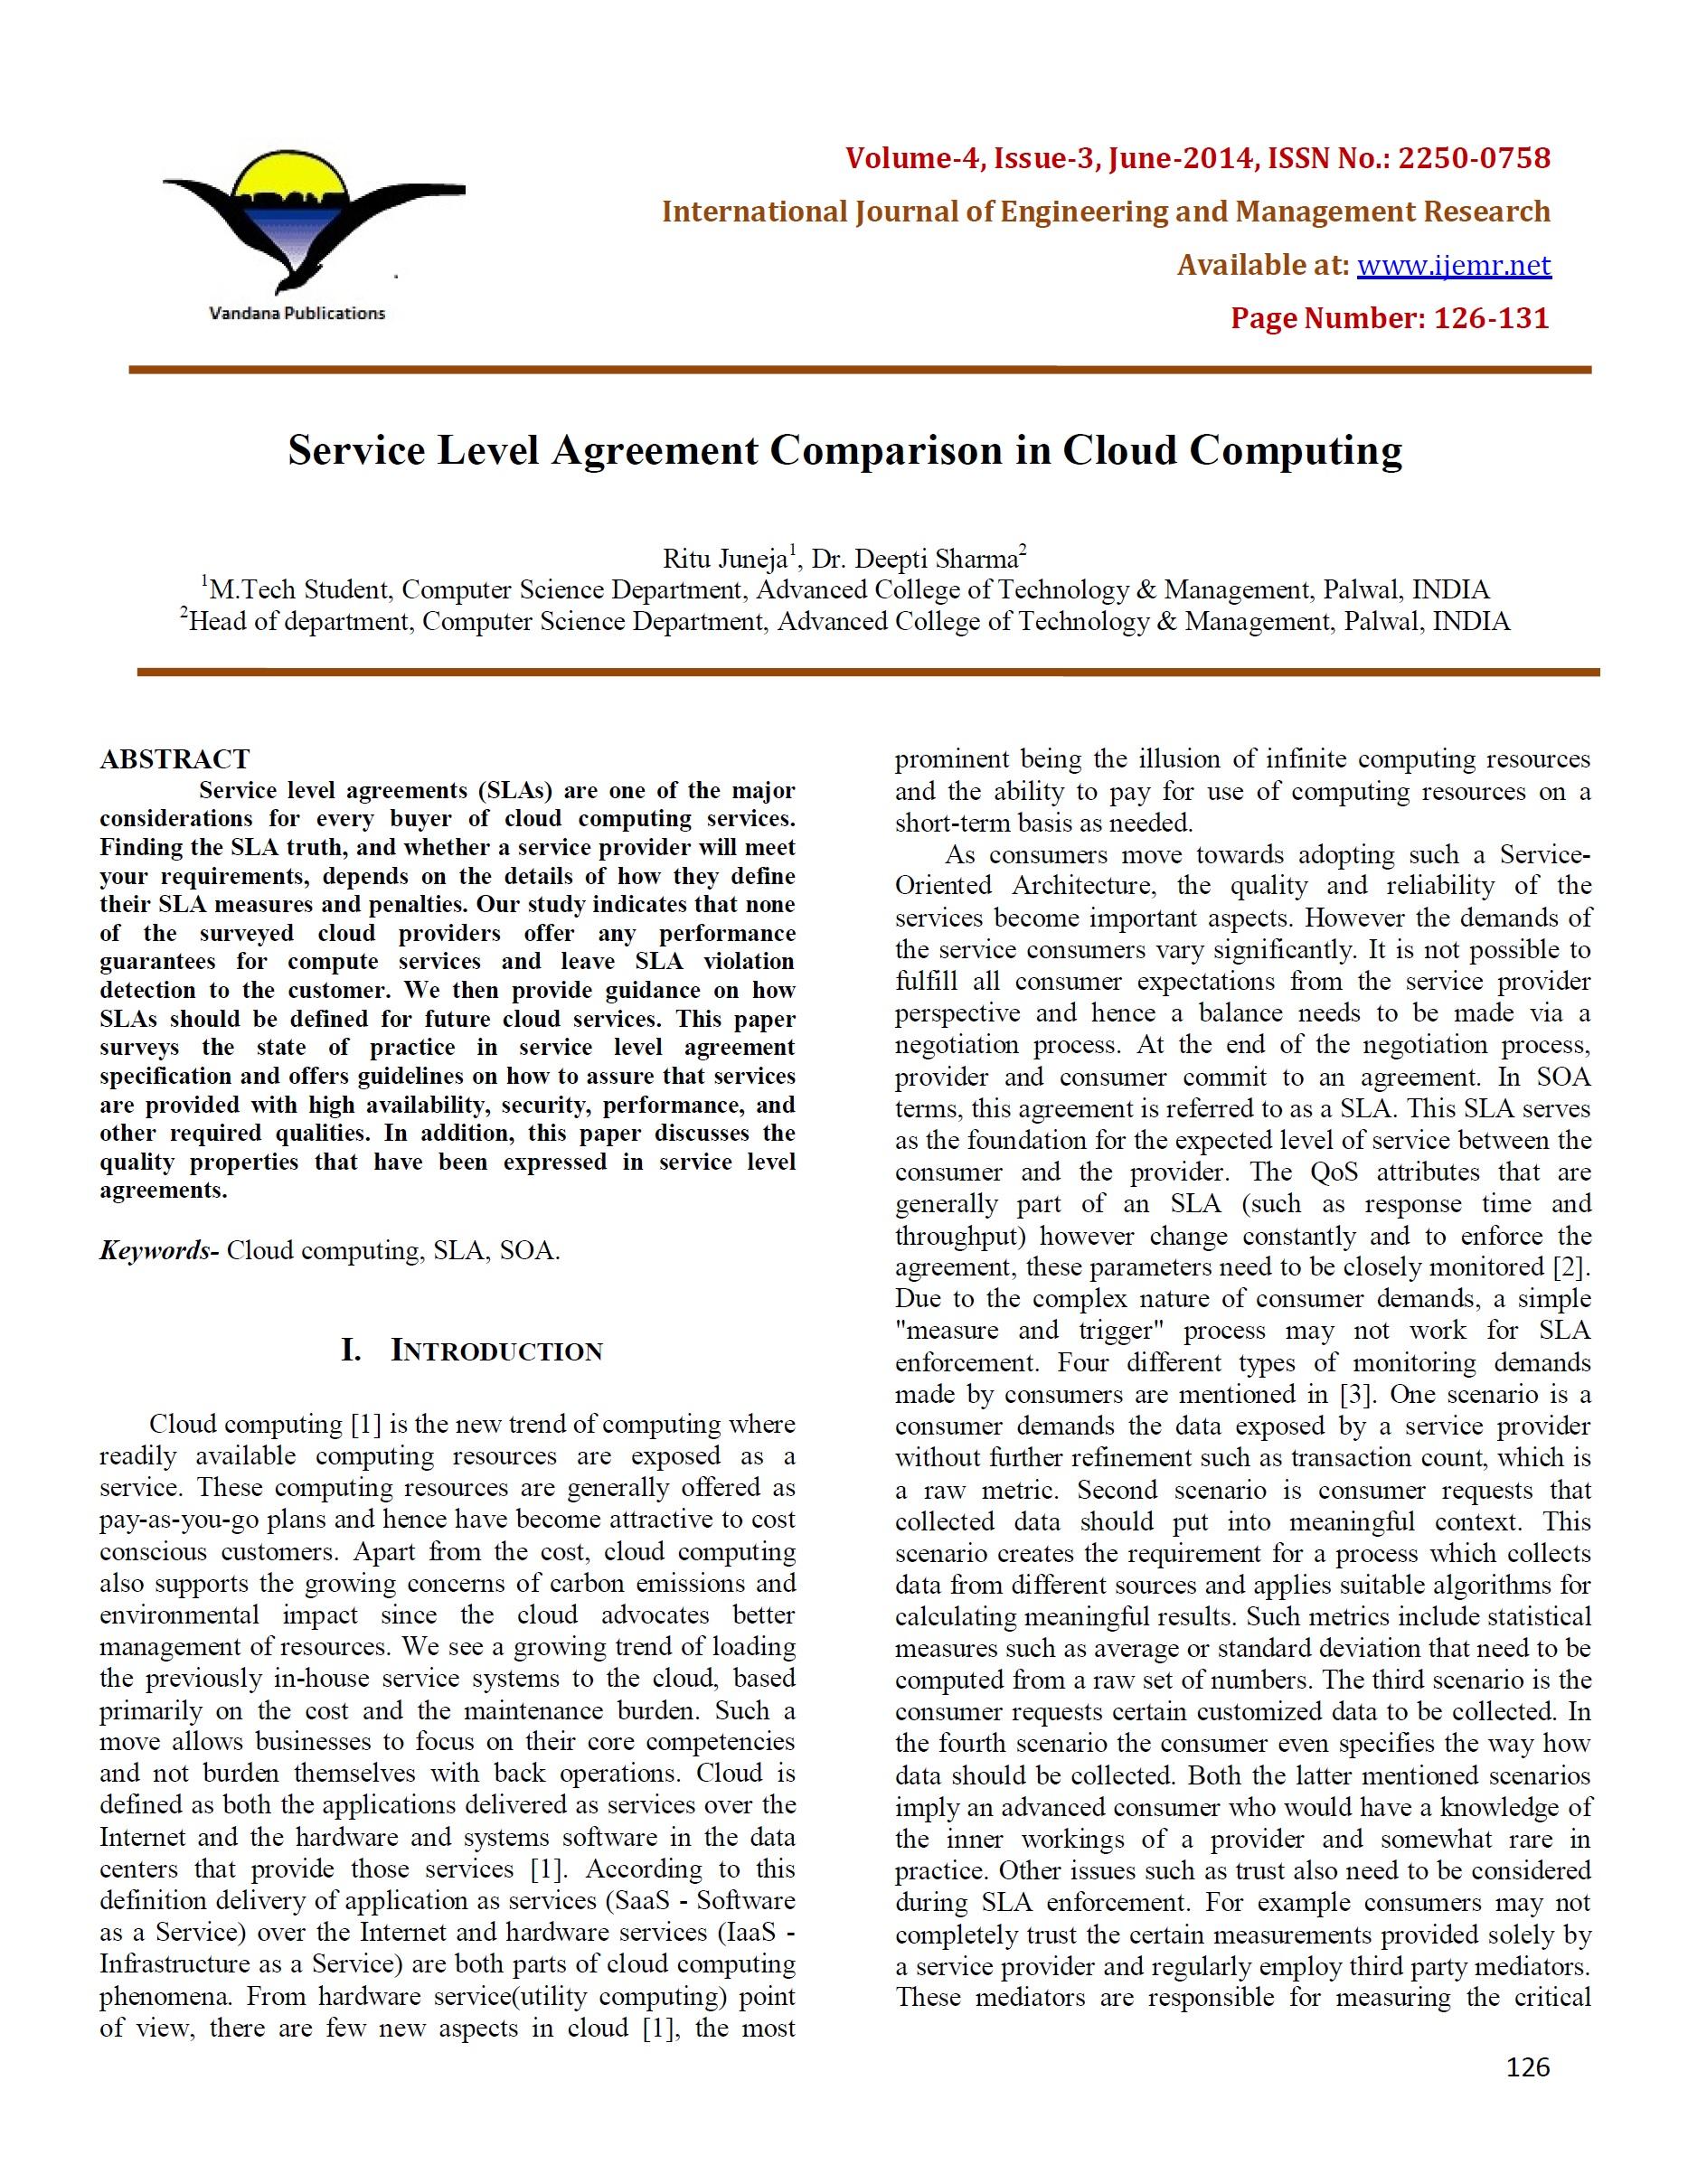 Service Level Agreement Comparison in Cloud Computing – ijemr